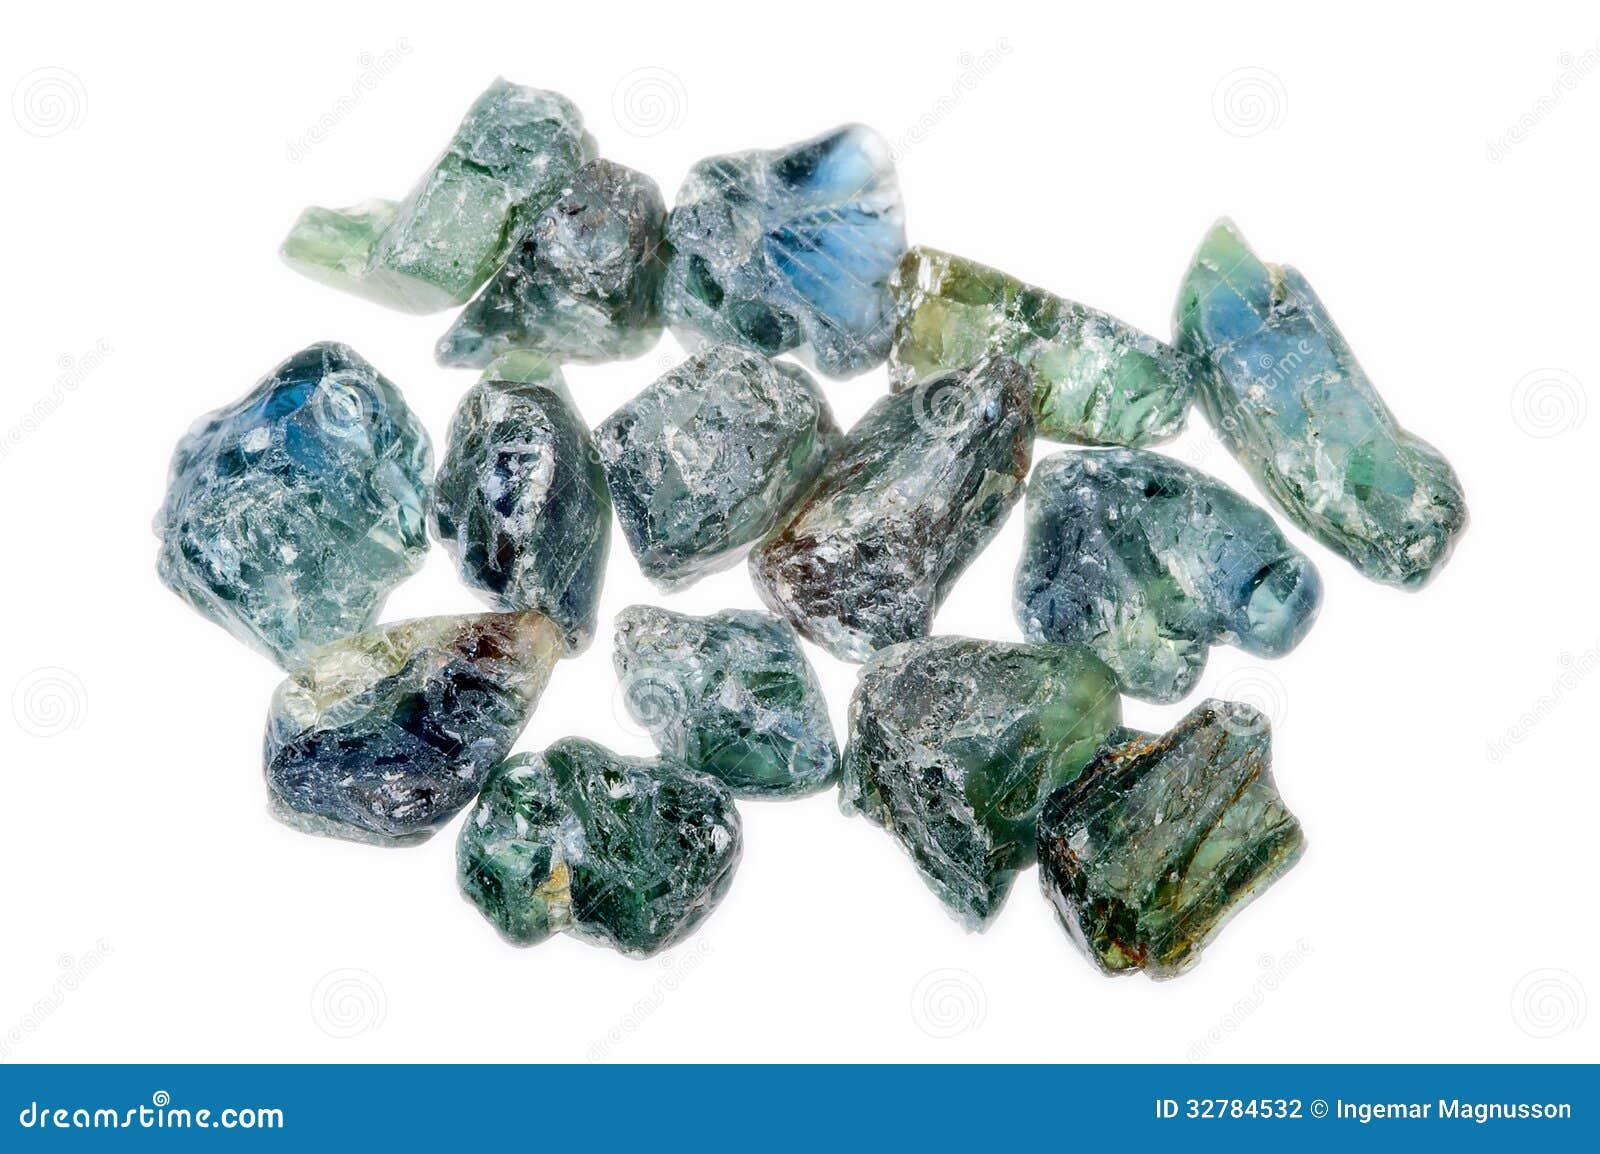 A Pile Of Rough Uncut Light Blue Green Sapphires Stock Photo